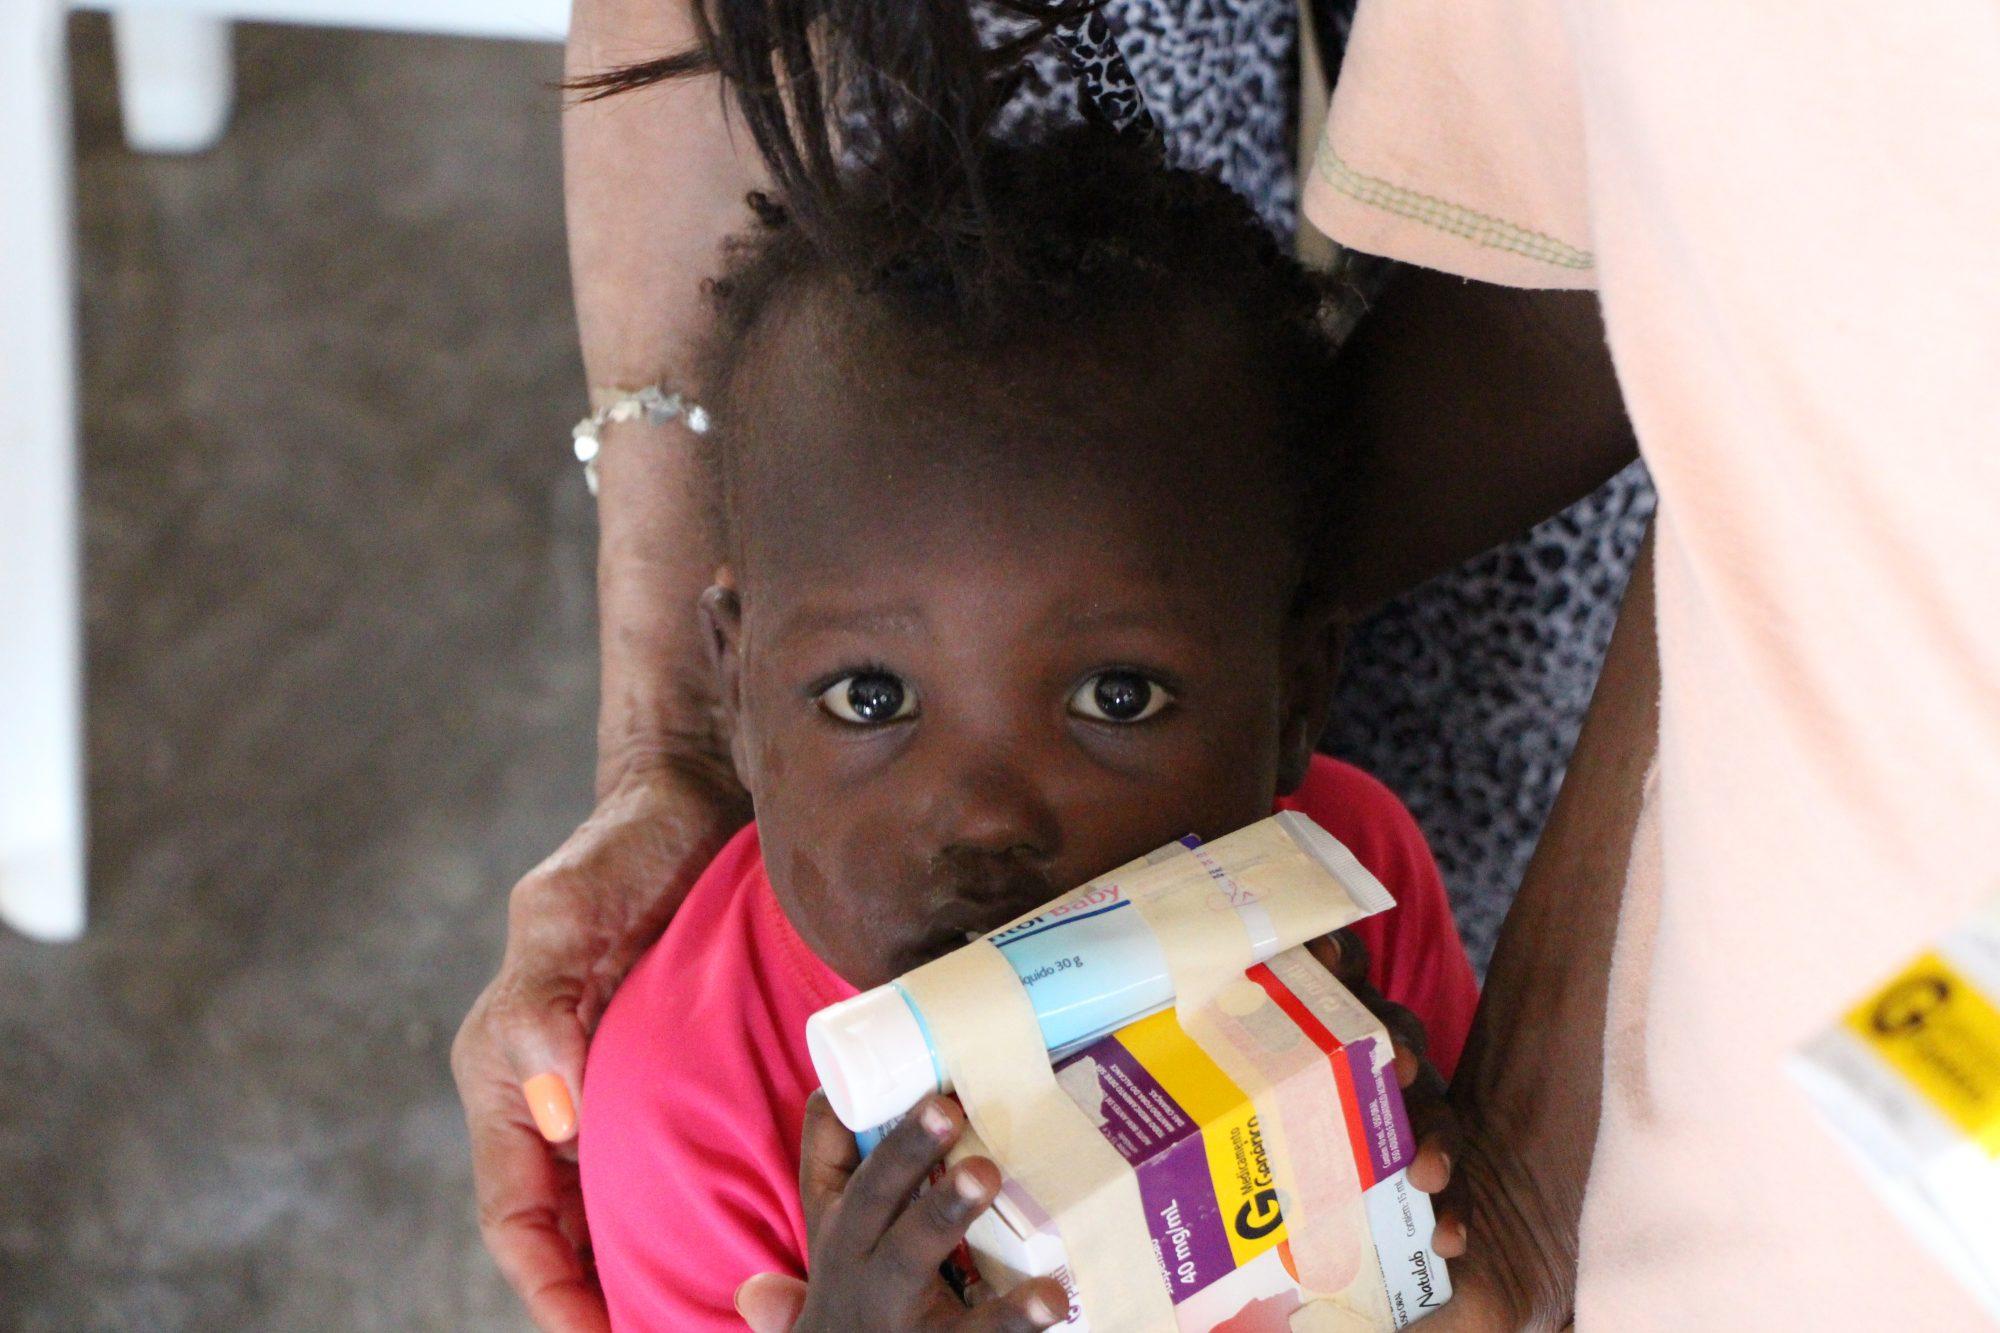 Criança socorrida pela Nations Help no Haiti